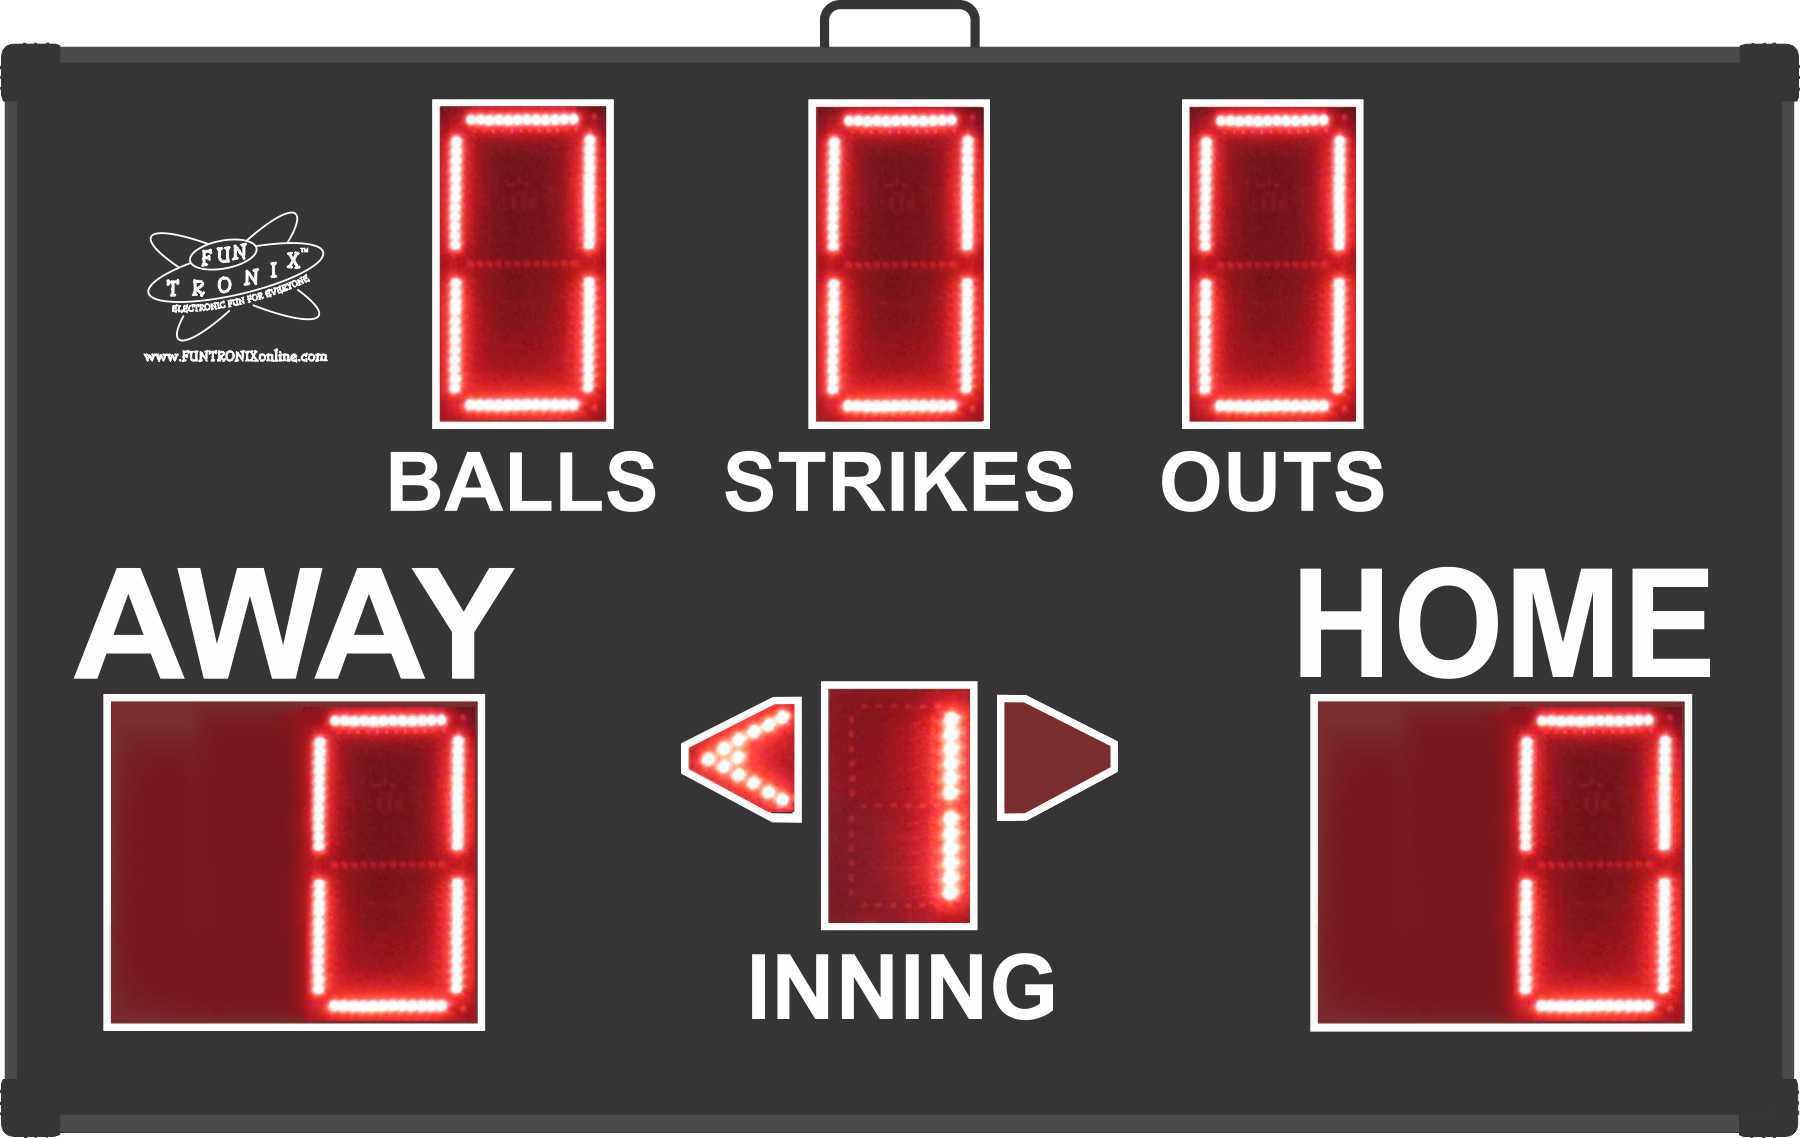 SNT-800BB Portable Baseball Scoreboard